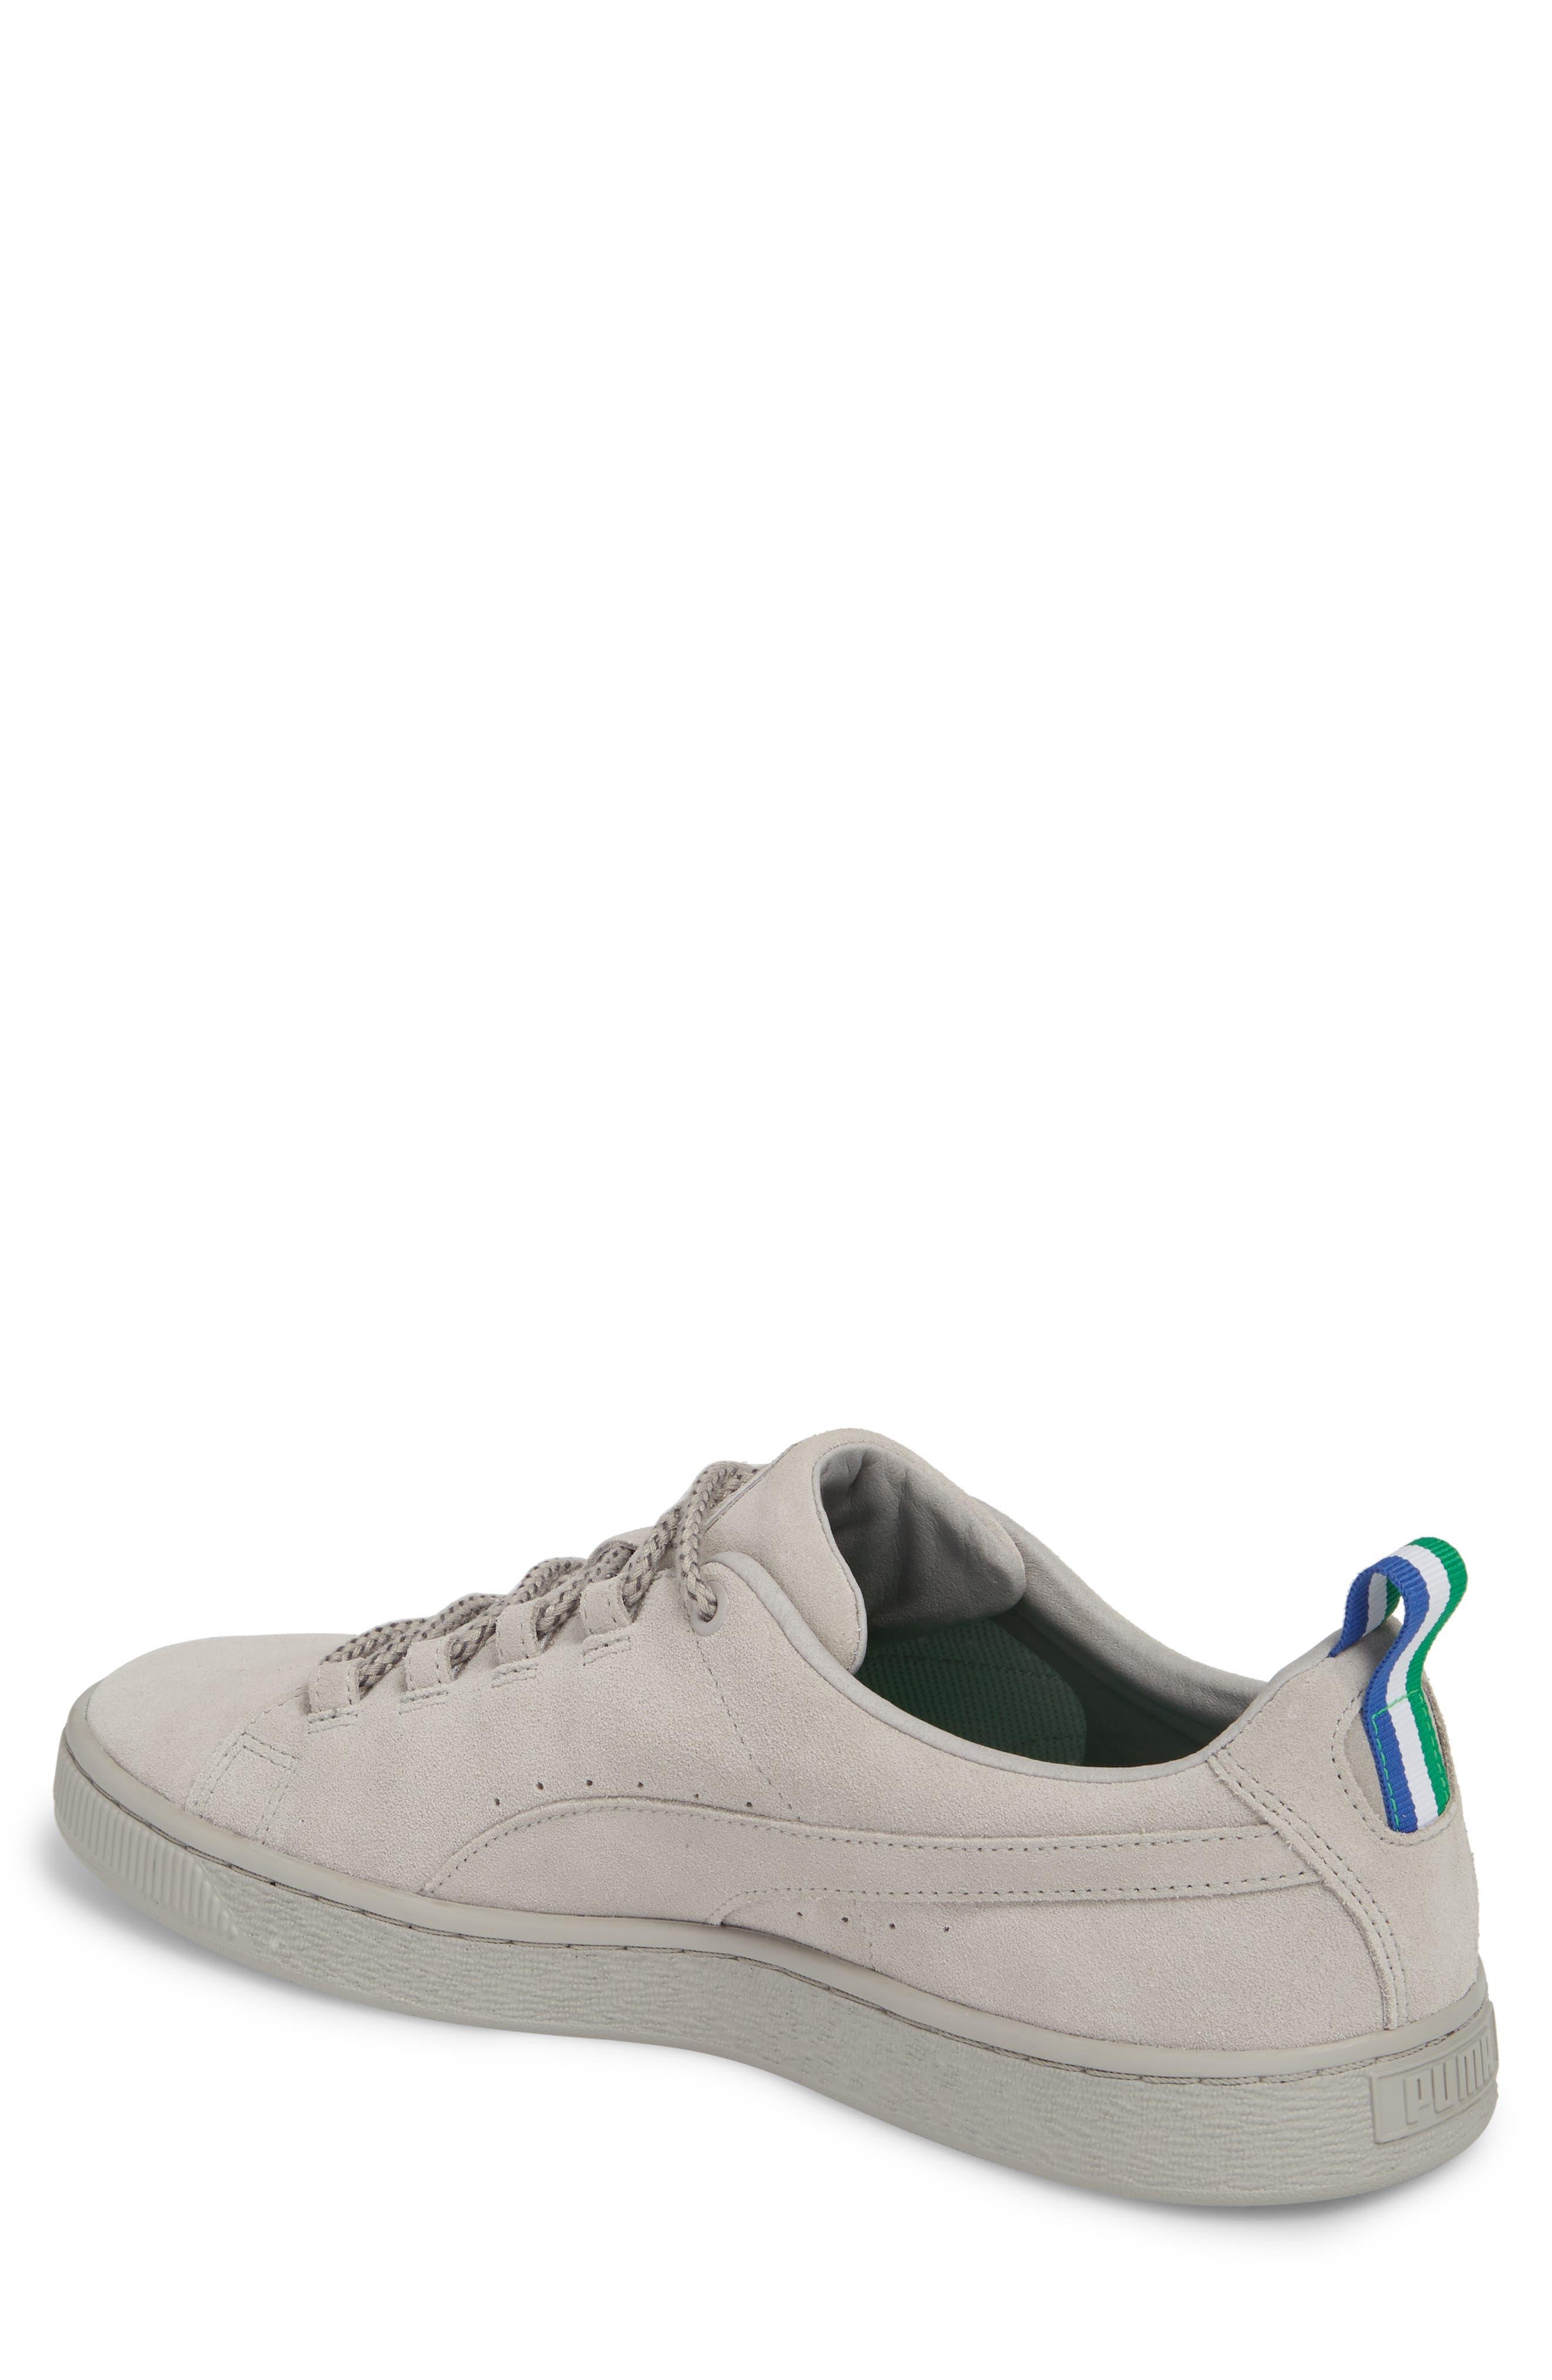 x Big Sean Suede Sneaker,                             Alternate thumbnail 2, color,                             Ash Leather/ Suede